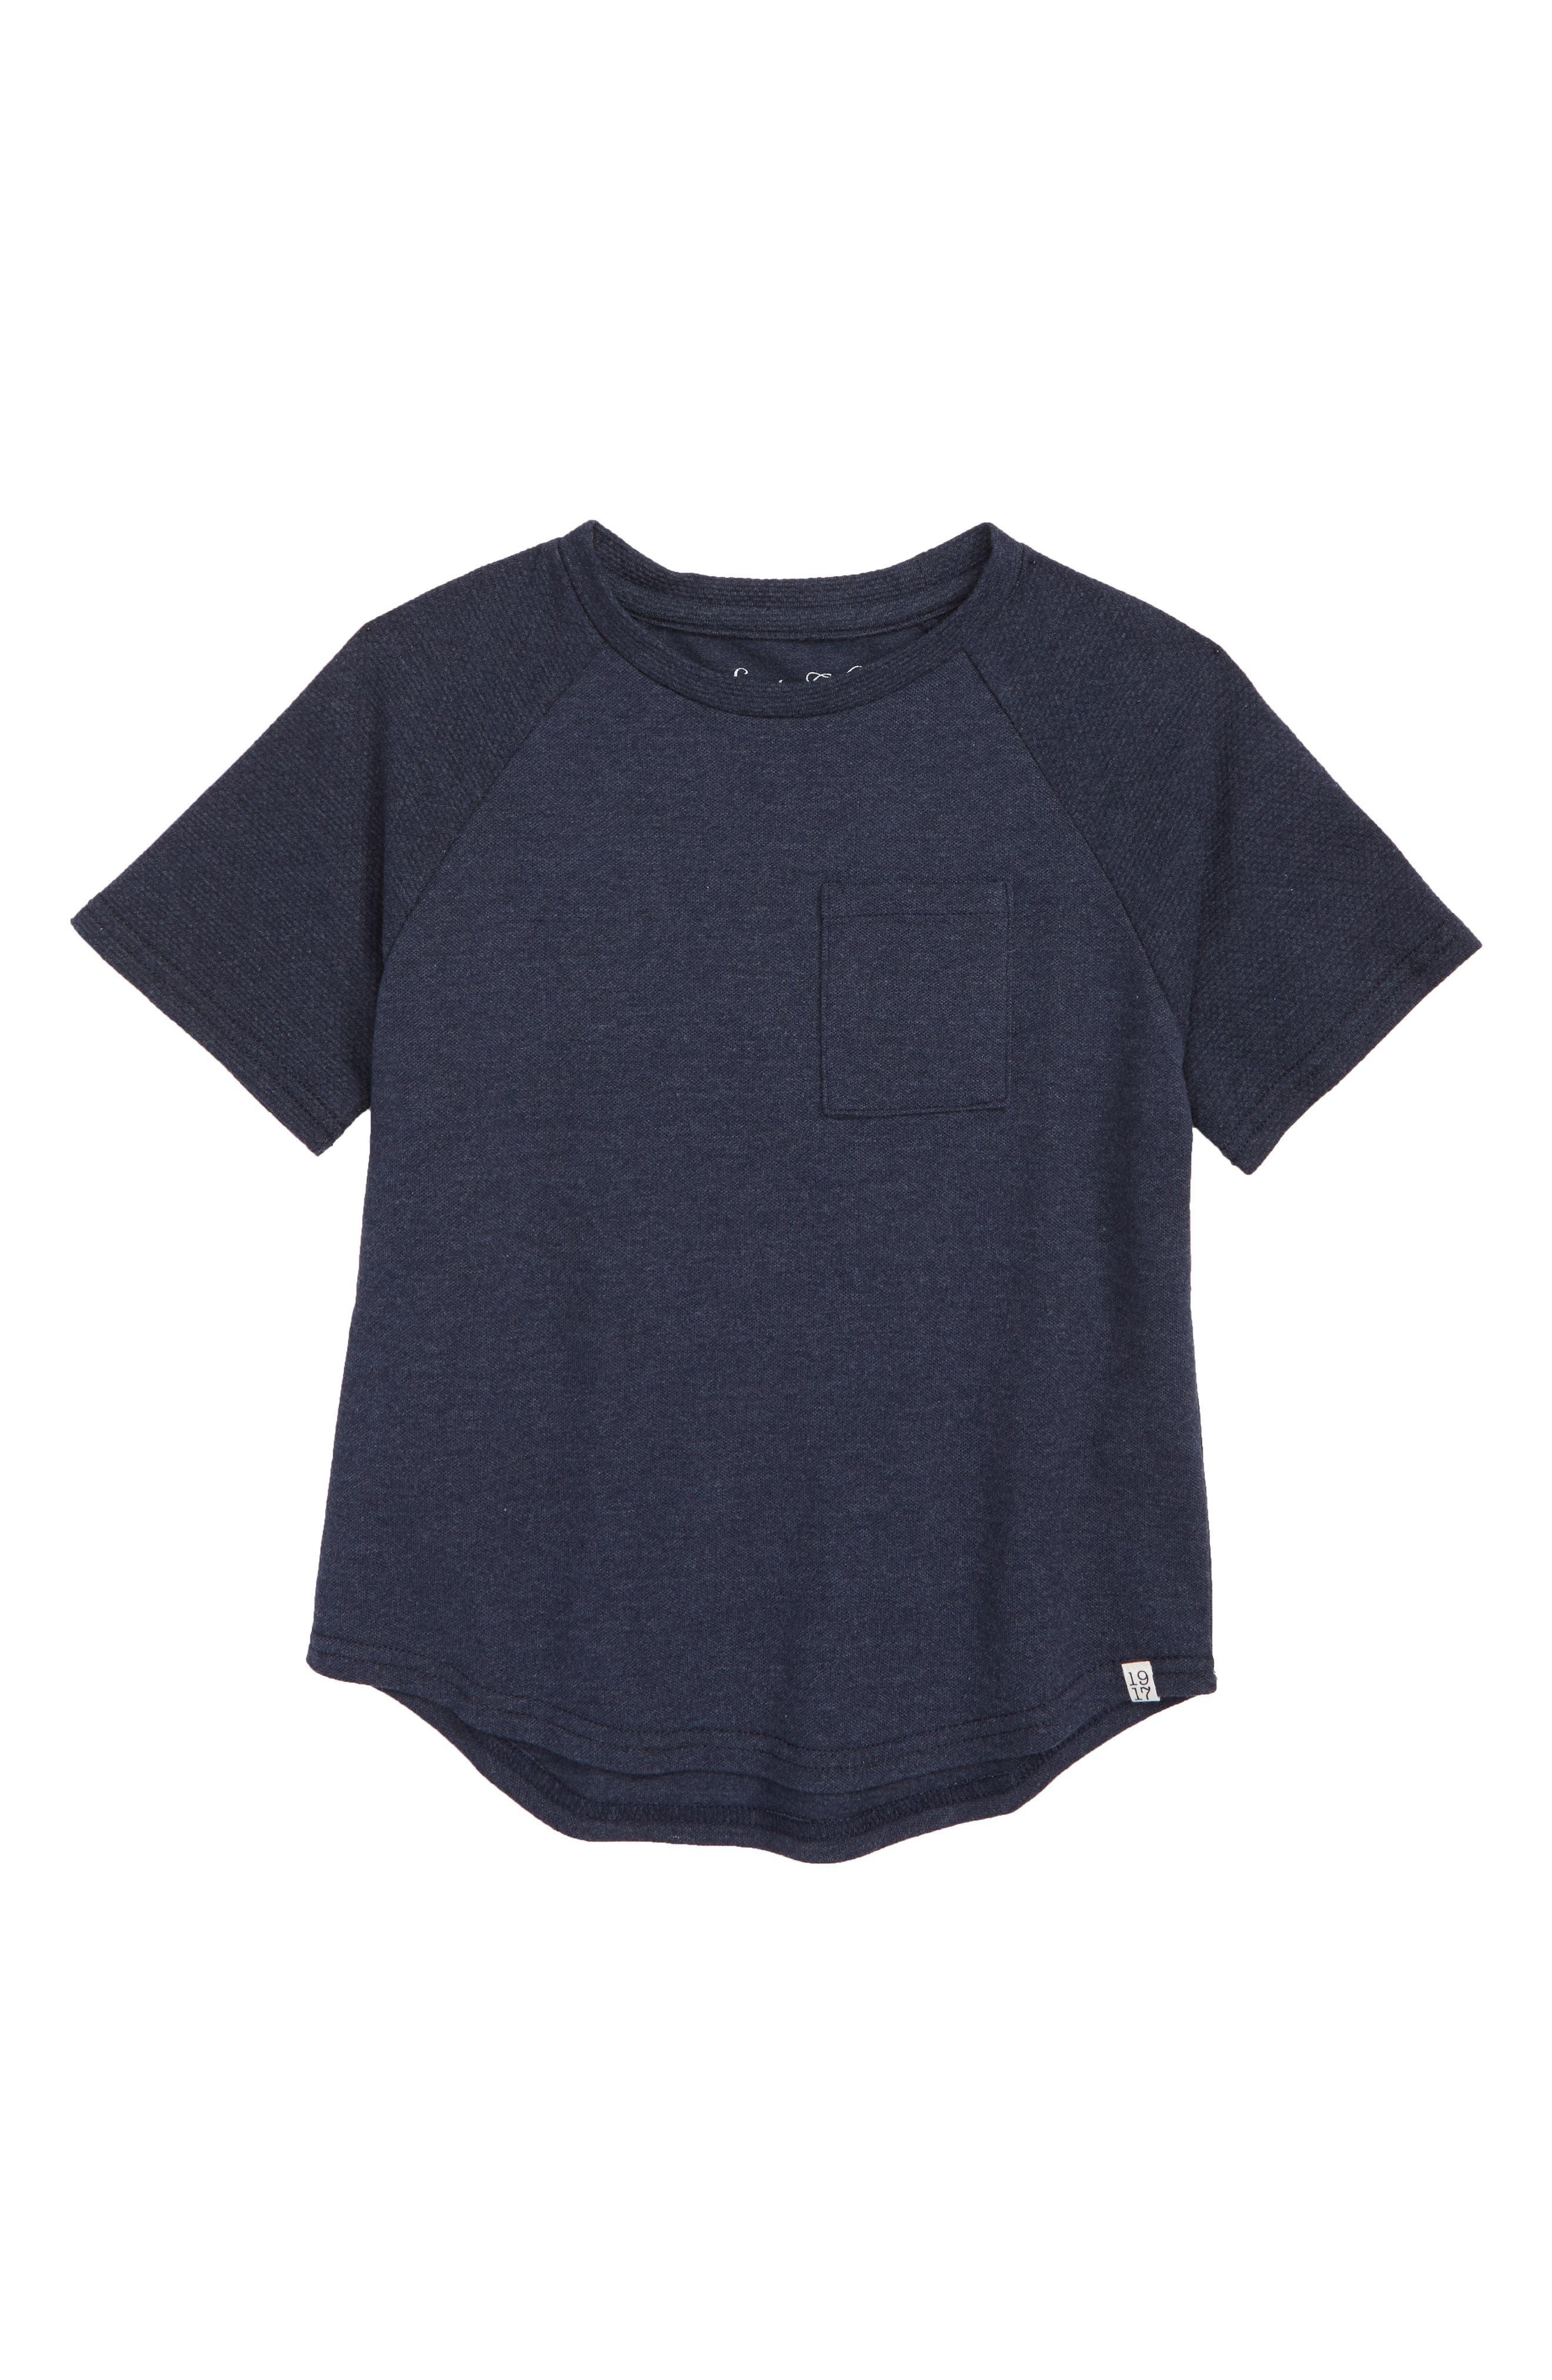 Suburb T-Shirt,                             Main thumbnail 1, color,                             HEATHER NAVY PIQUE